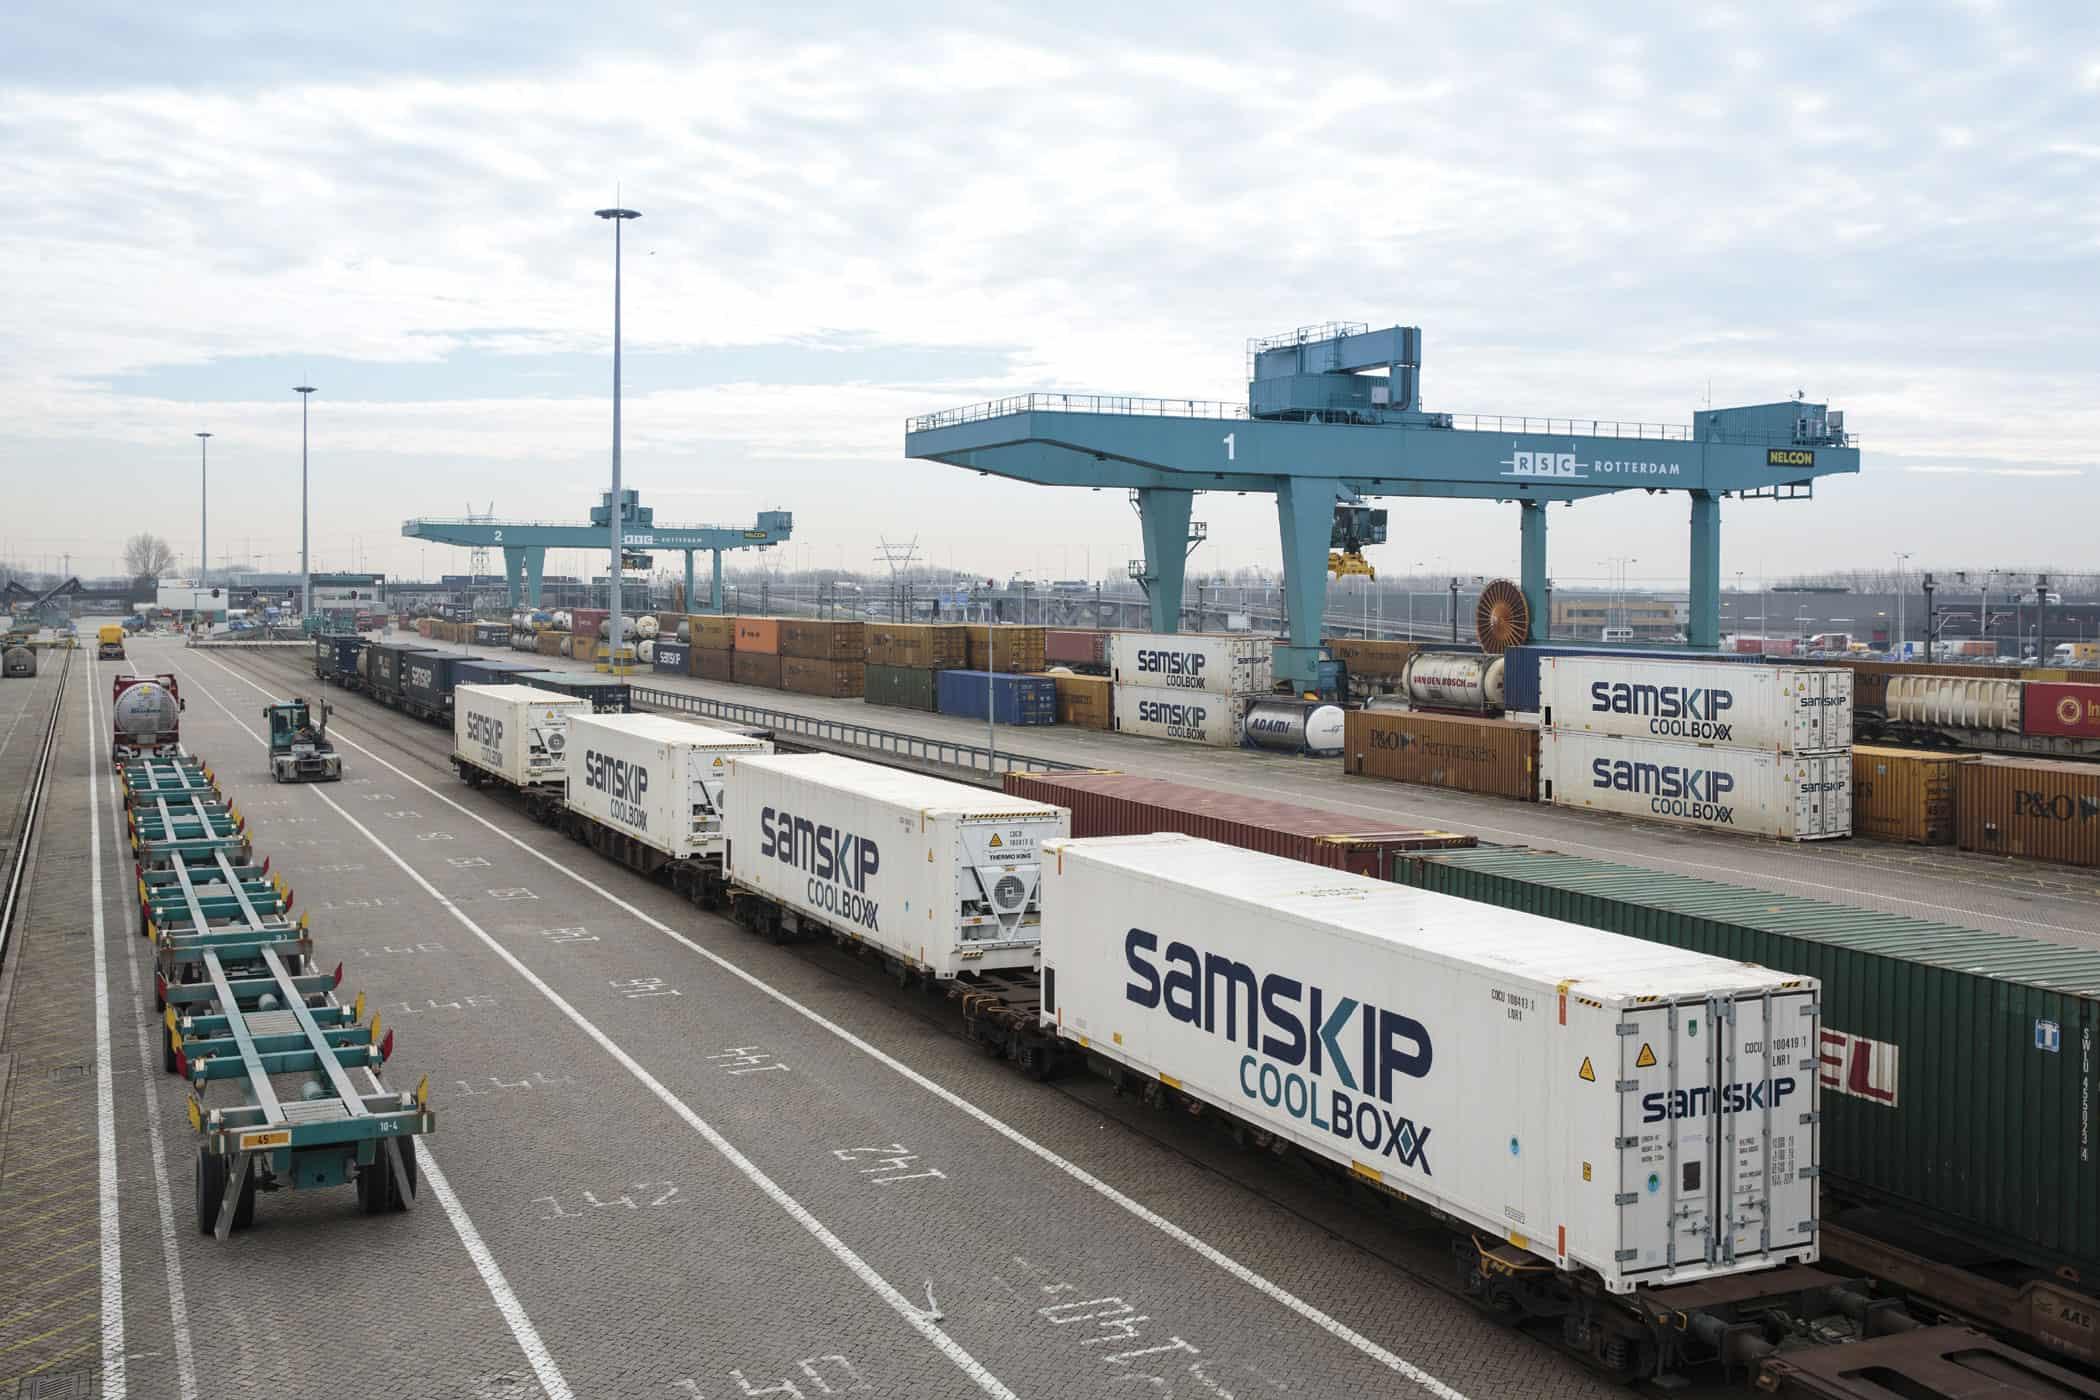 Samskip Multimodal adds 140 new reefers to its fleet